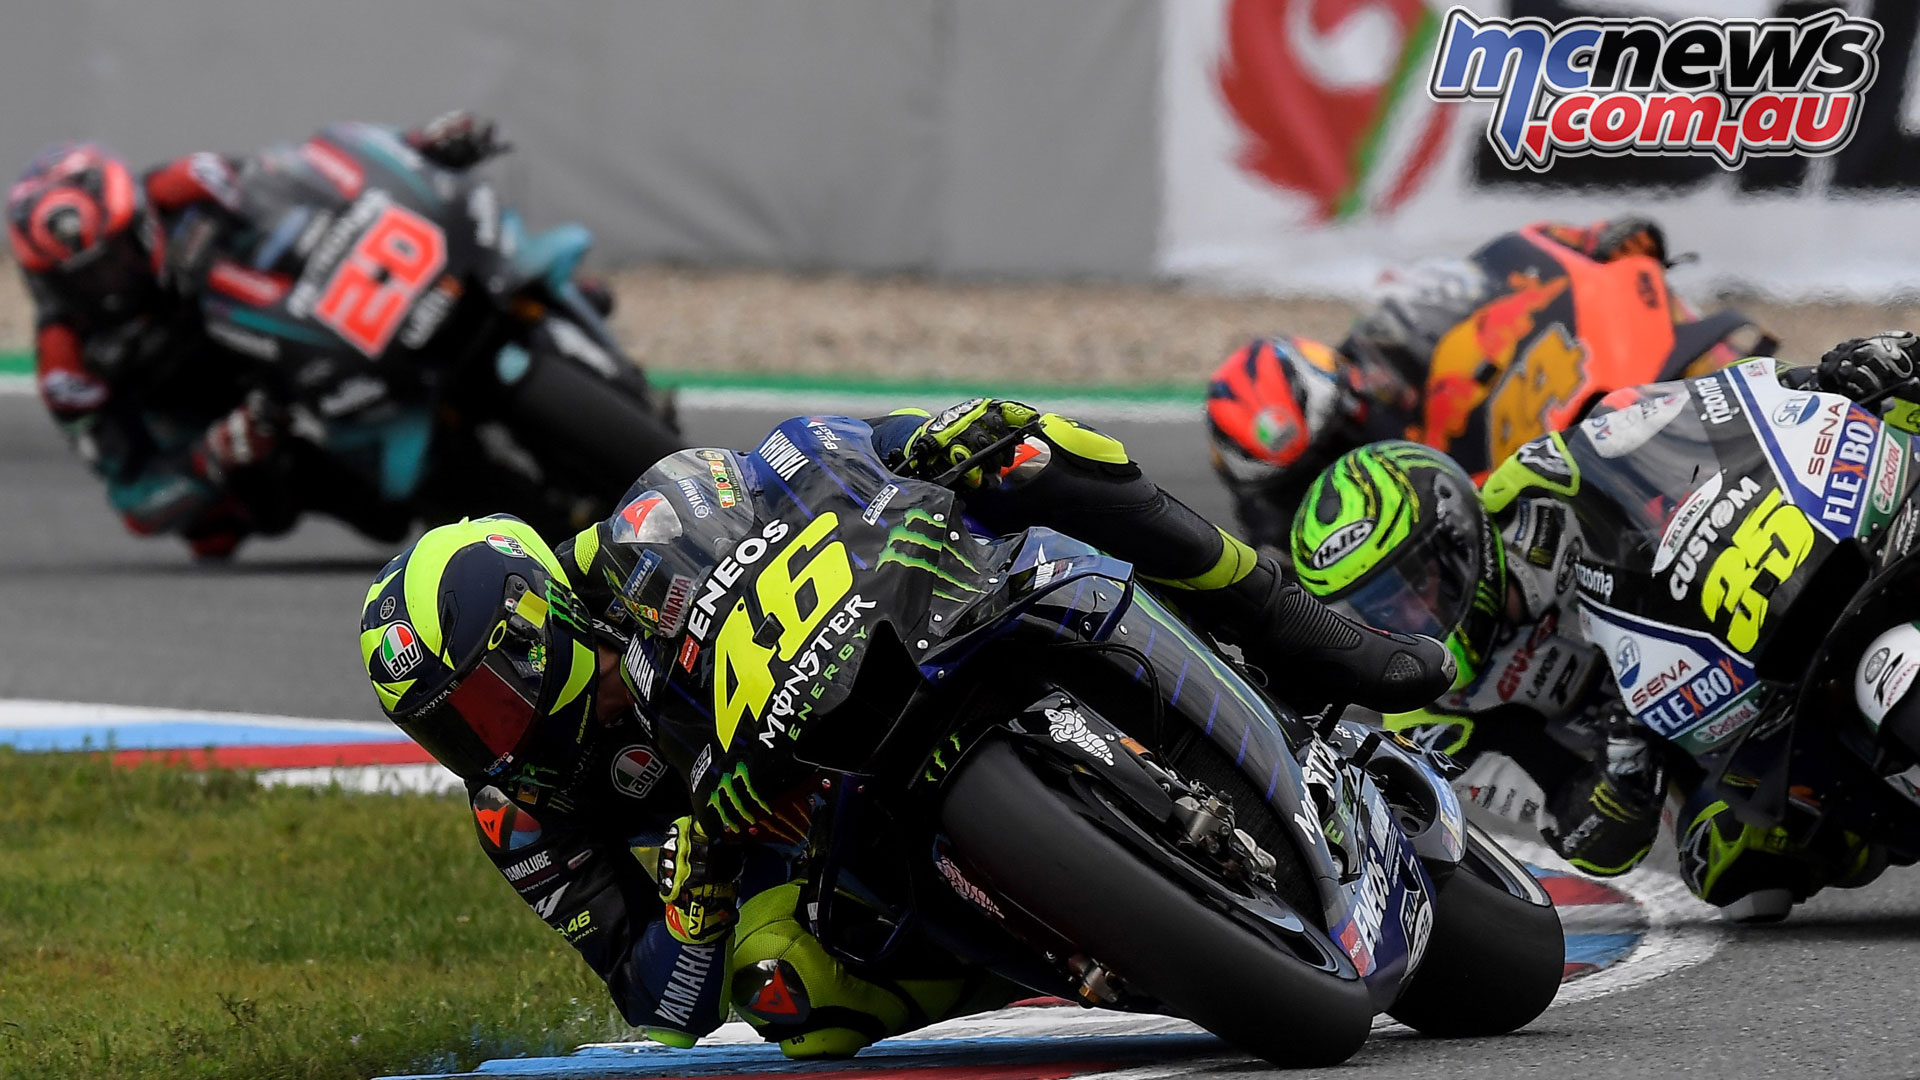 MotoGP Rnd Brno Valentino Rossi